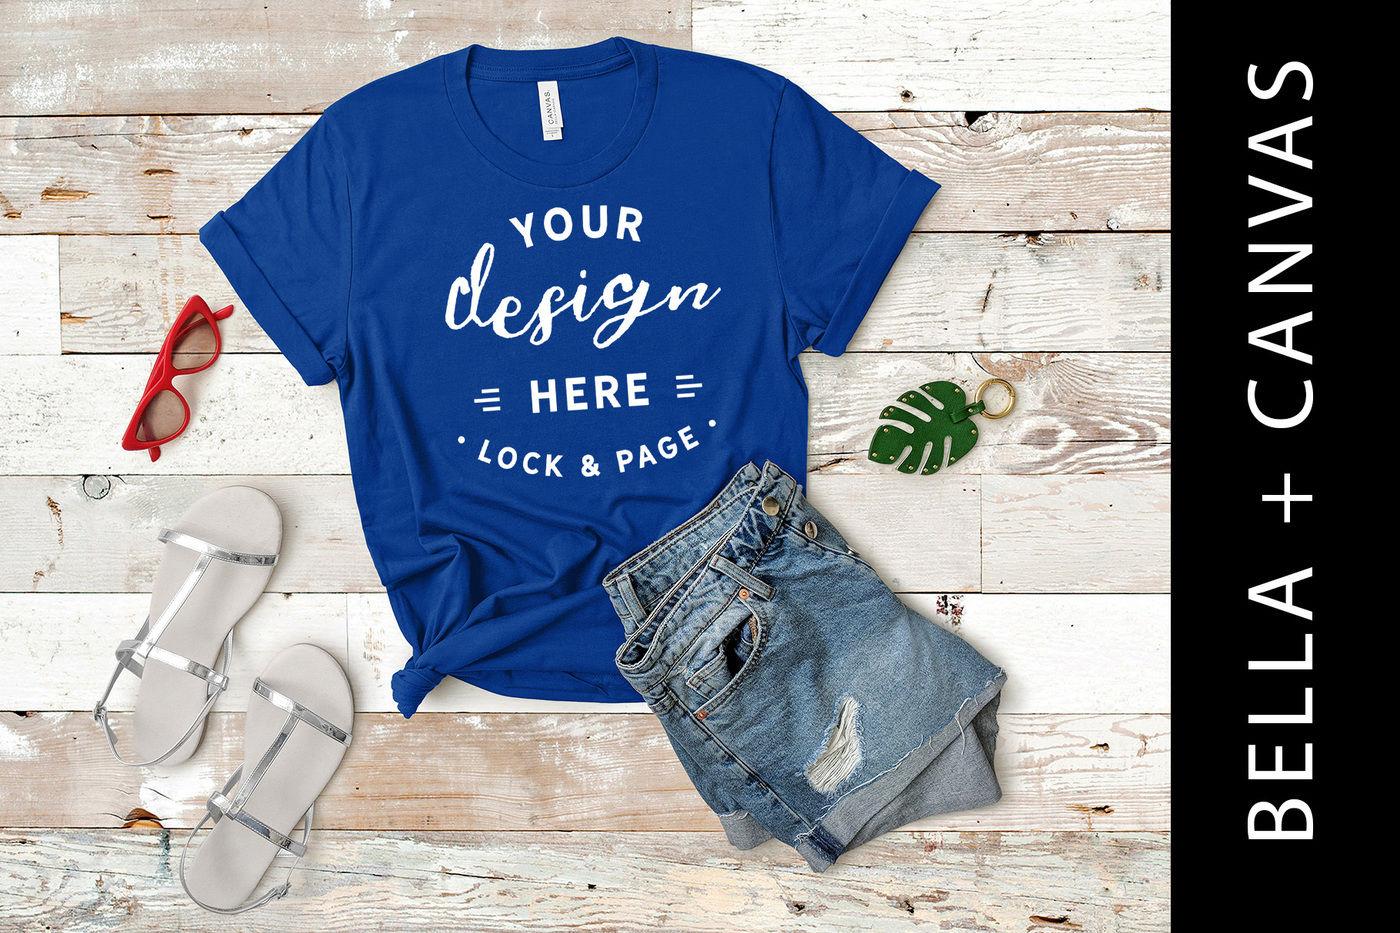 True Royal Bella Canvas 3001 T Shirt Mockup Blue T Shirt Flat Lay